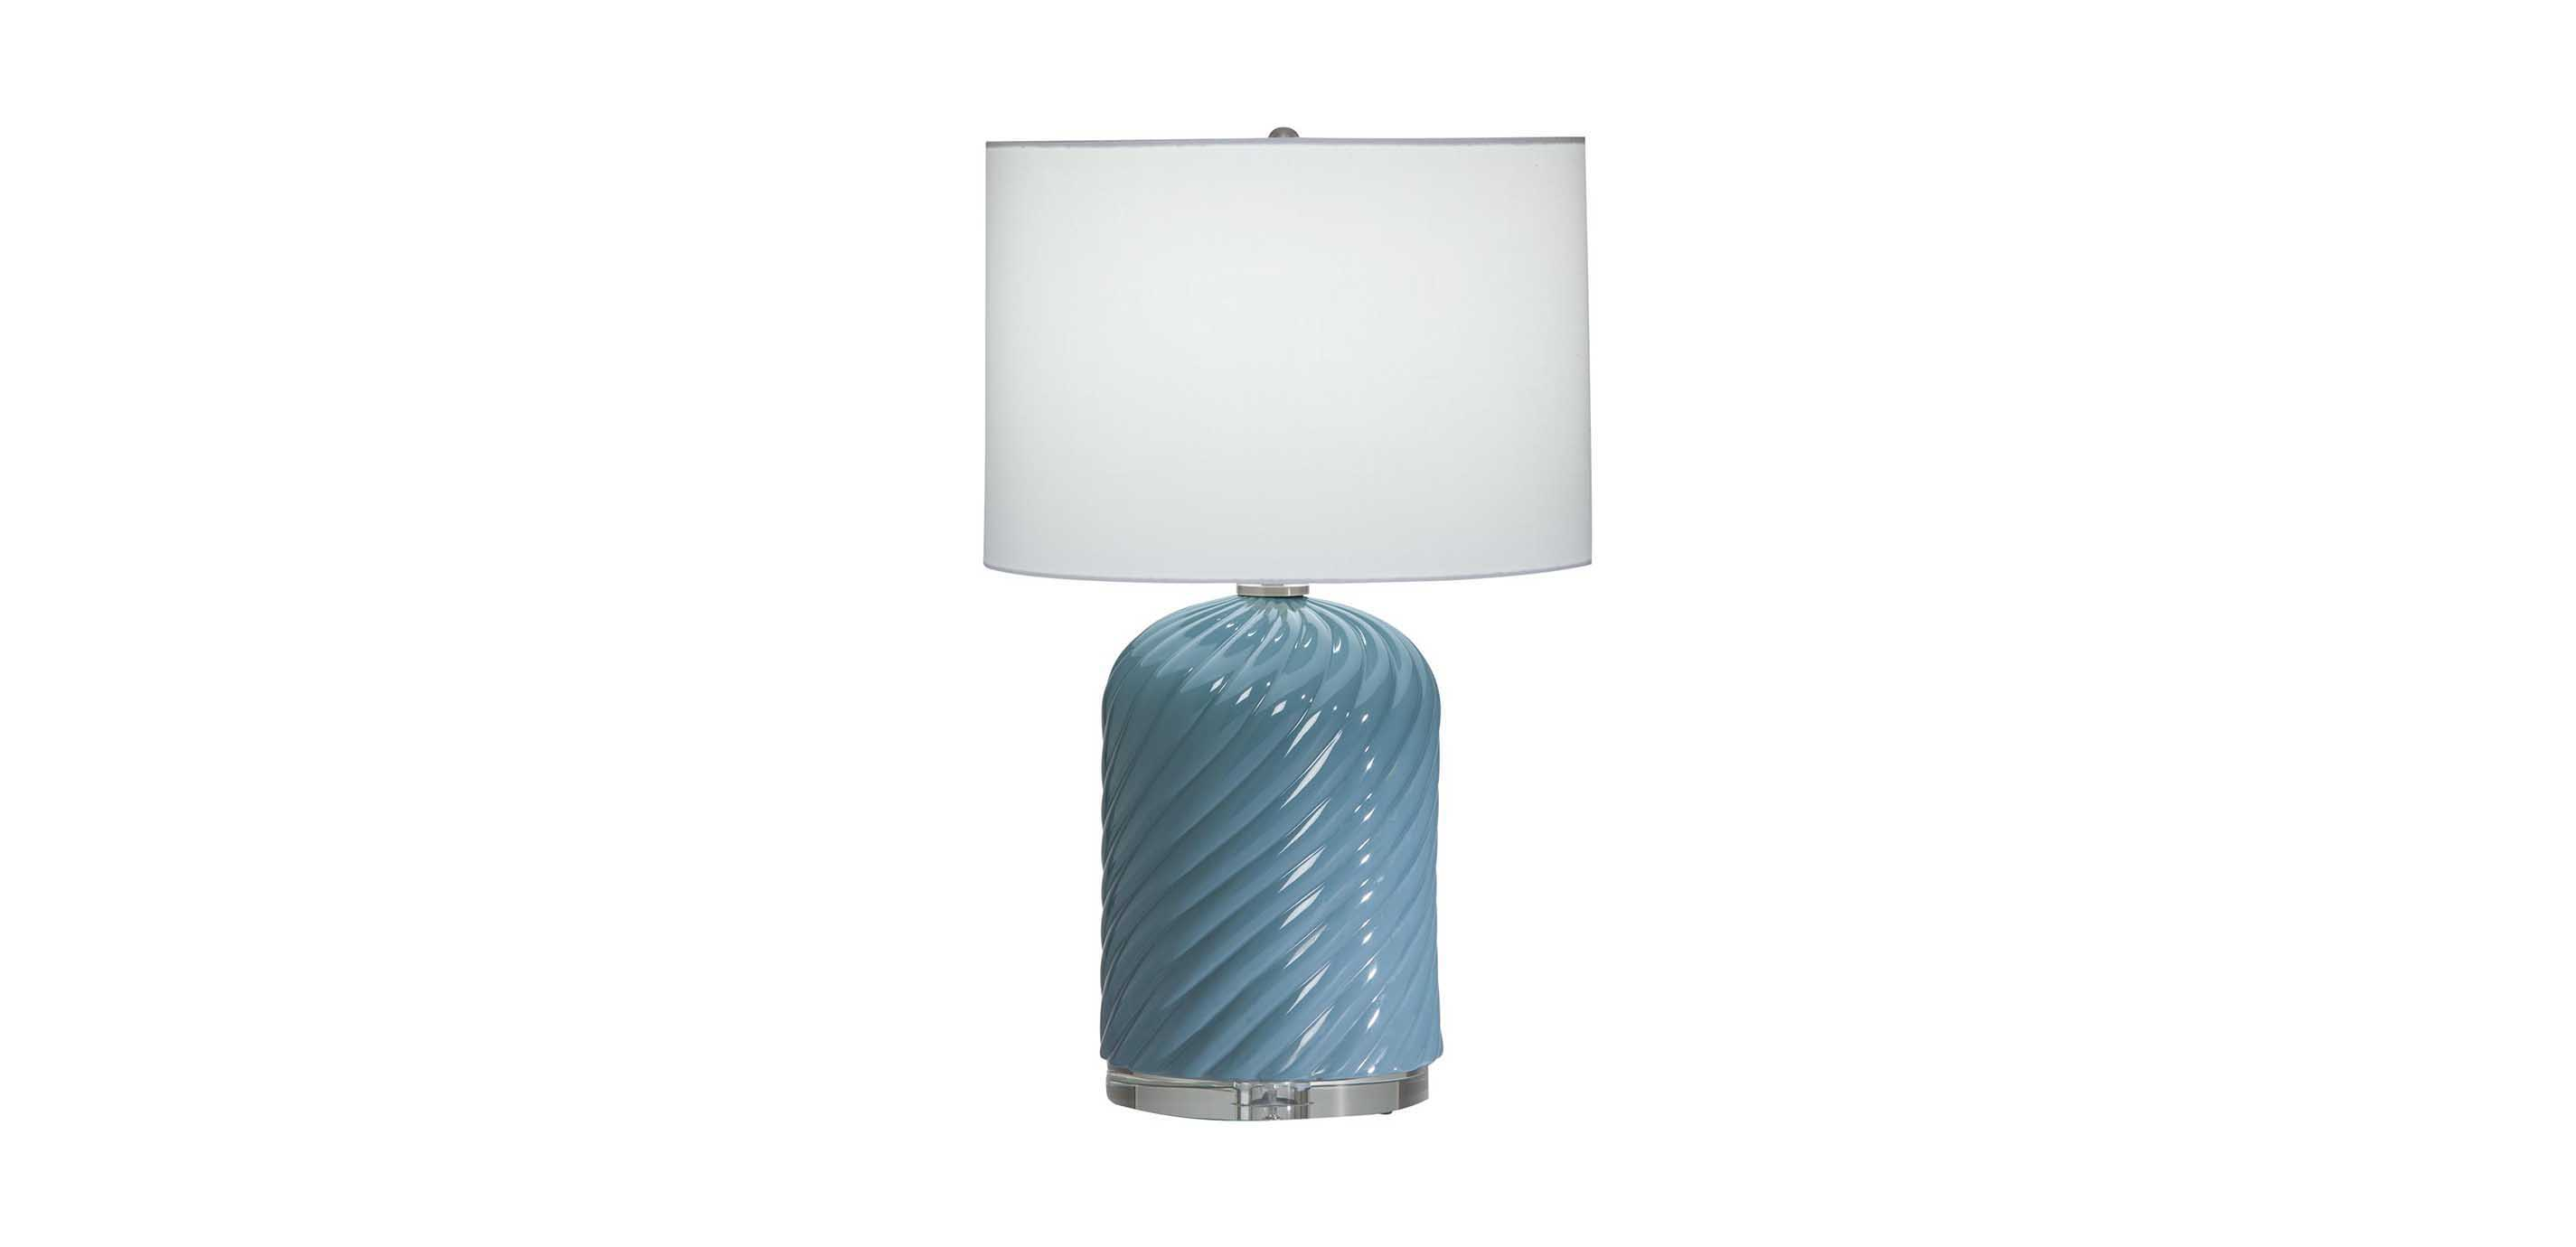 Quinn blue or ivory table lamp ceramic base table lamps ethan allen quinn ceramic table lamp aloadofball Images